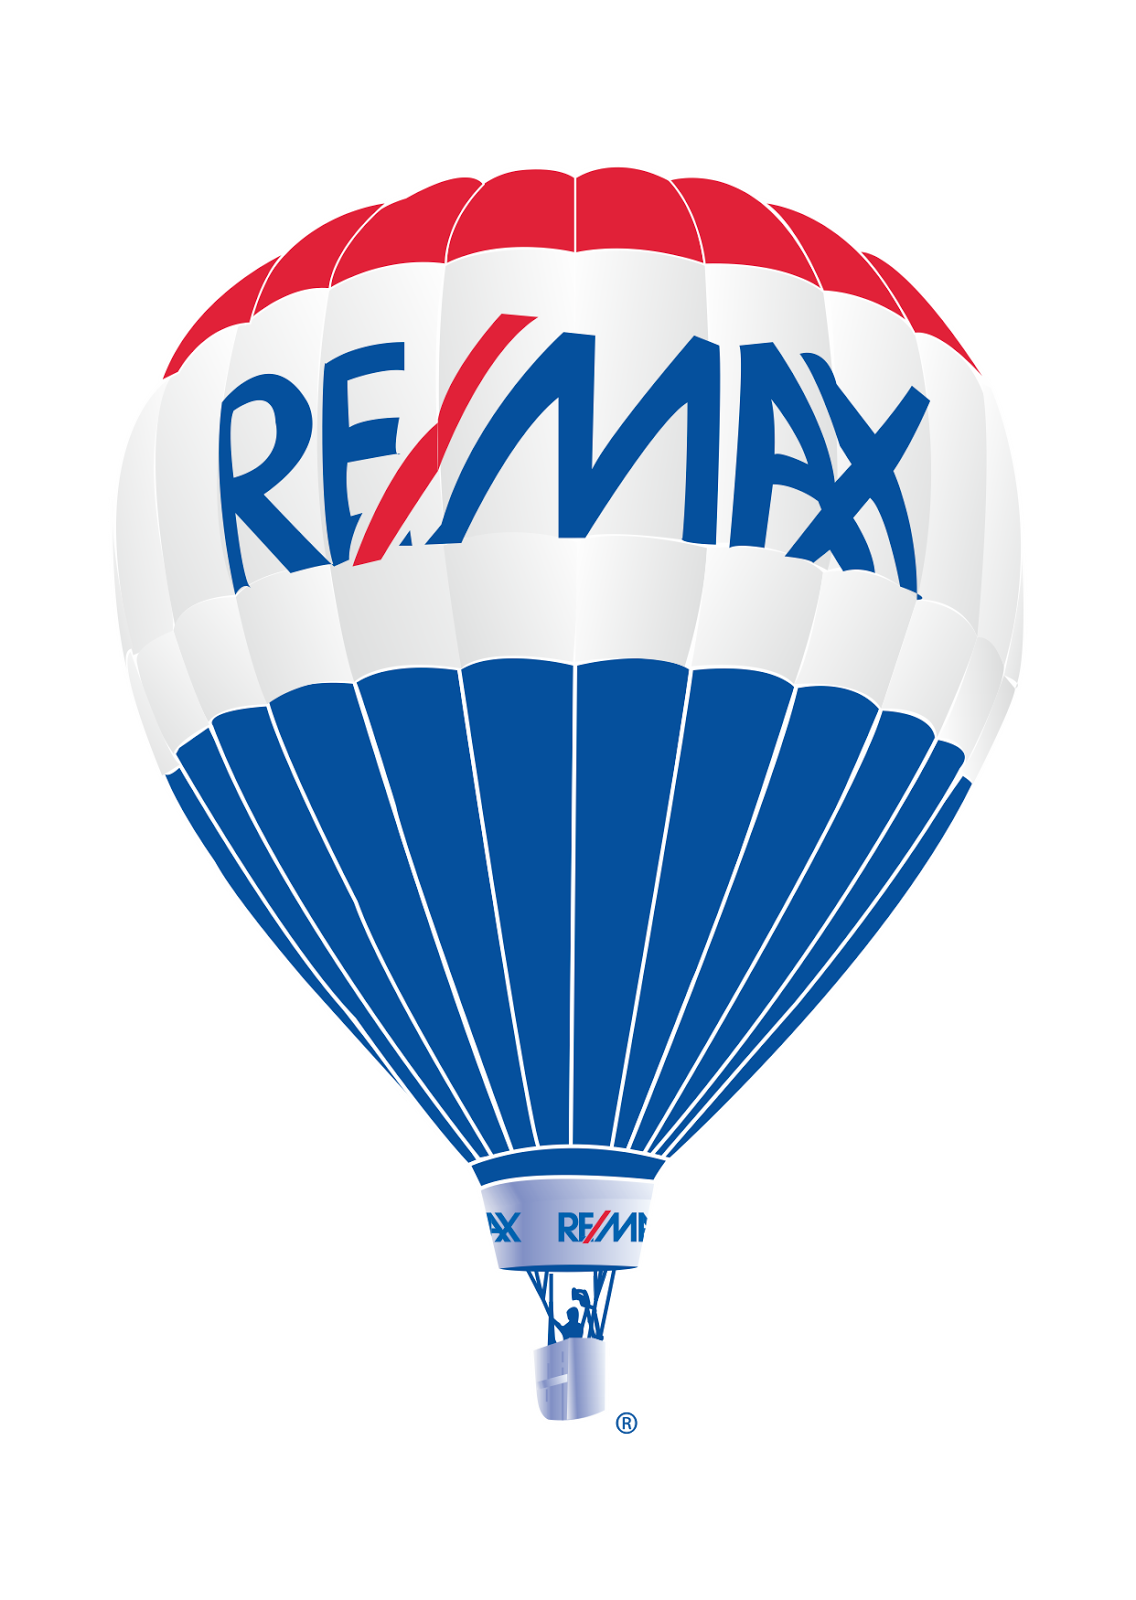 Bal O Remax Logo Vector Daire Ic Tasarim Tasarim Brosur